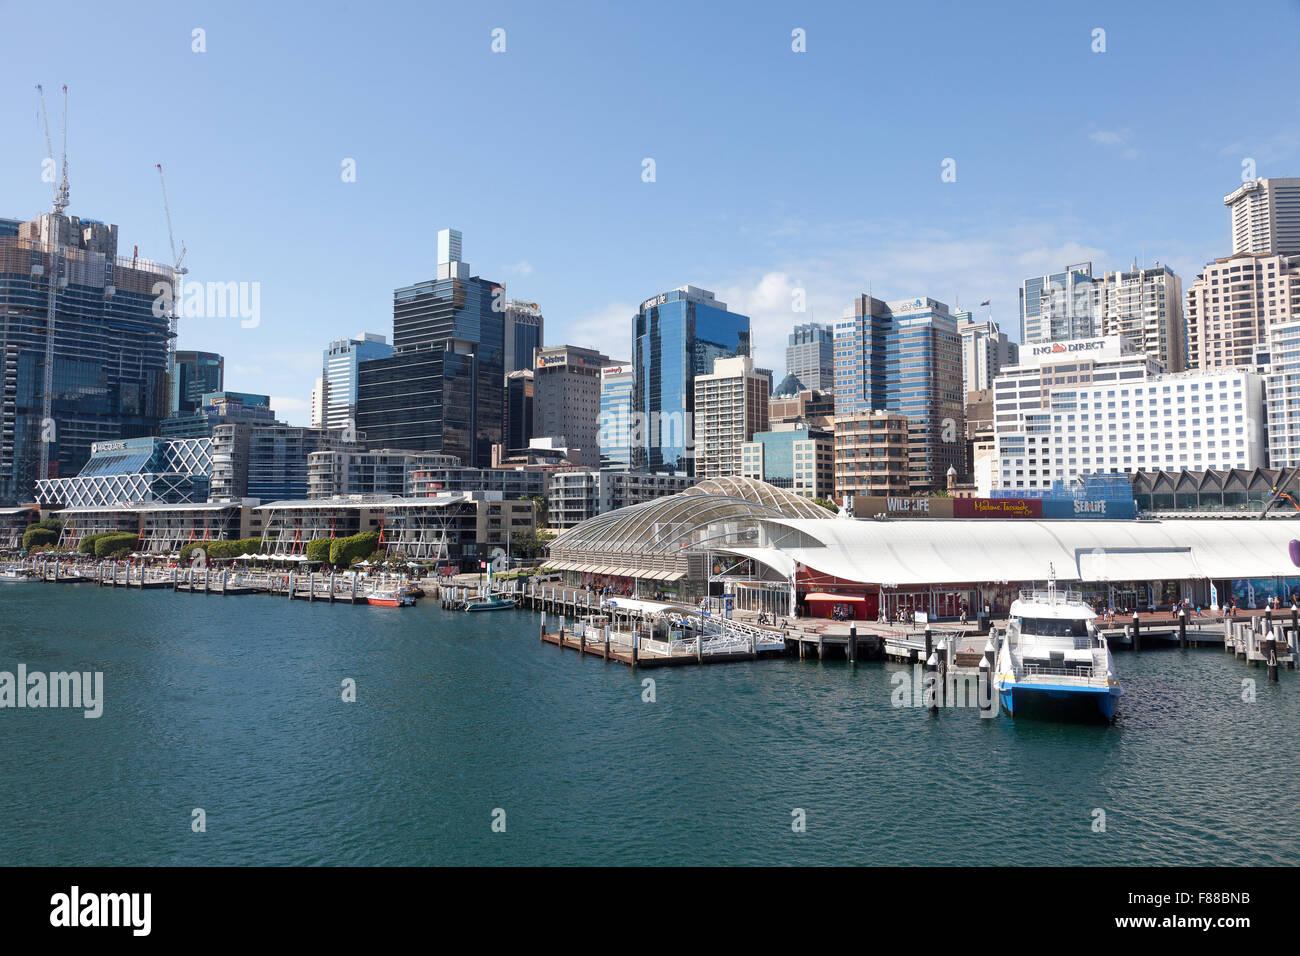 Darling Harbour, Sydney, NSW, Australia - Stock Image